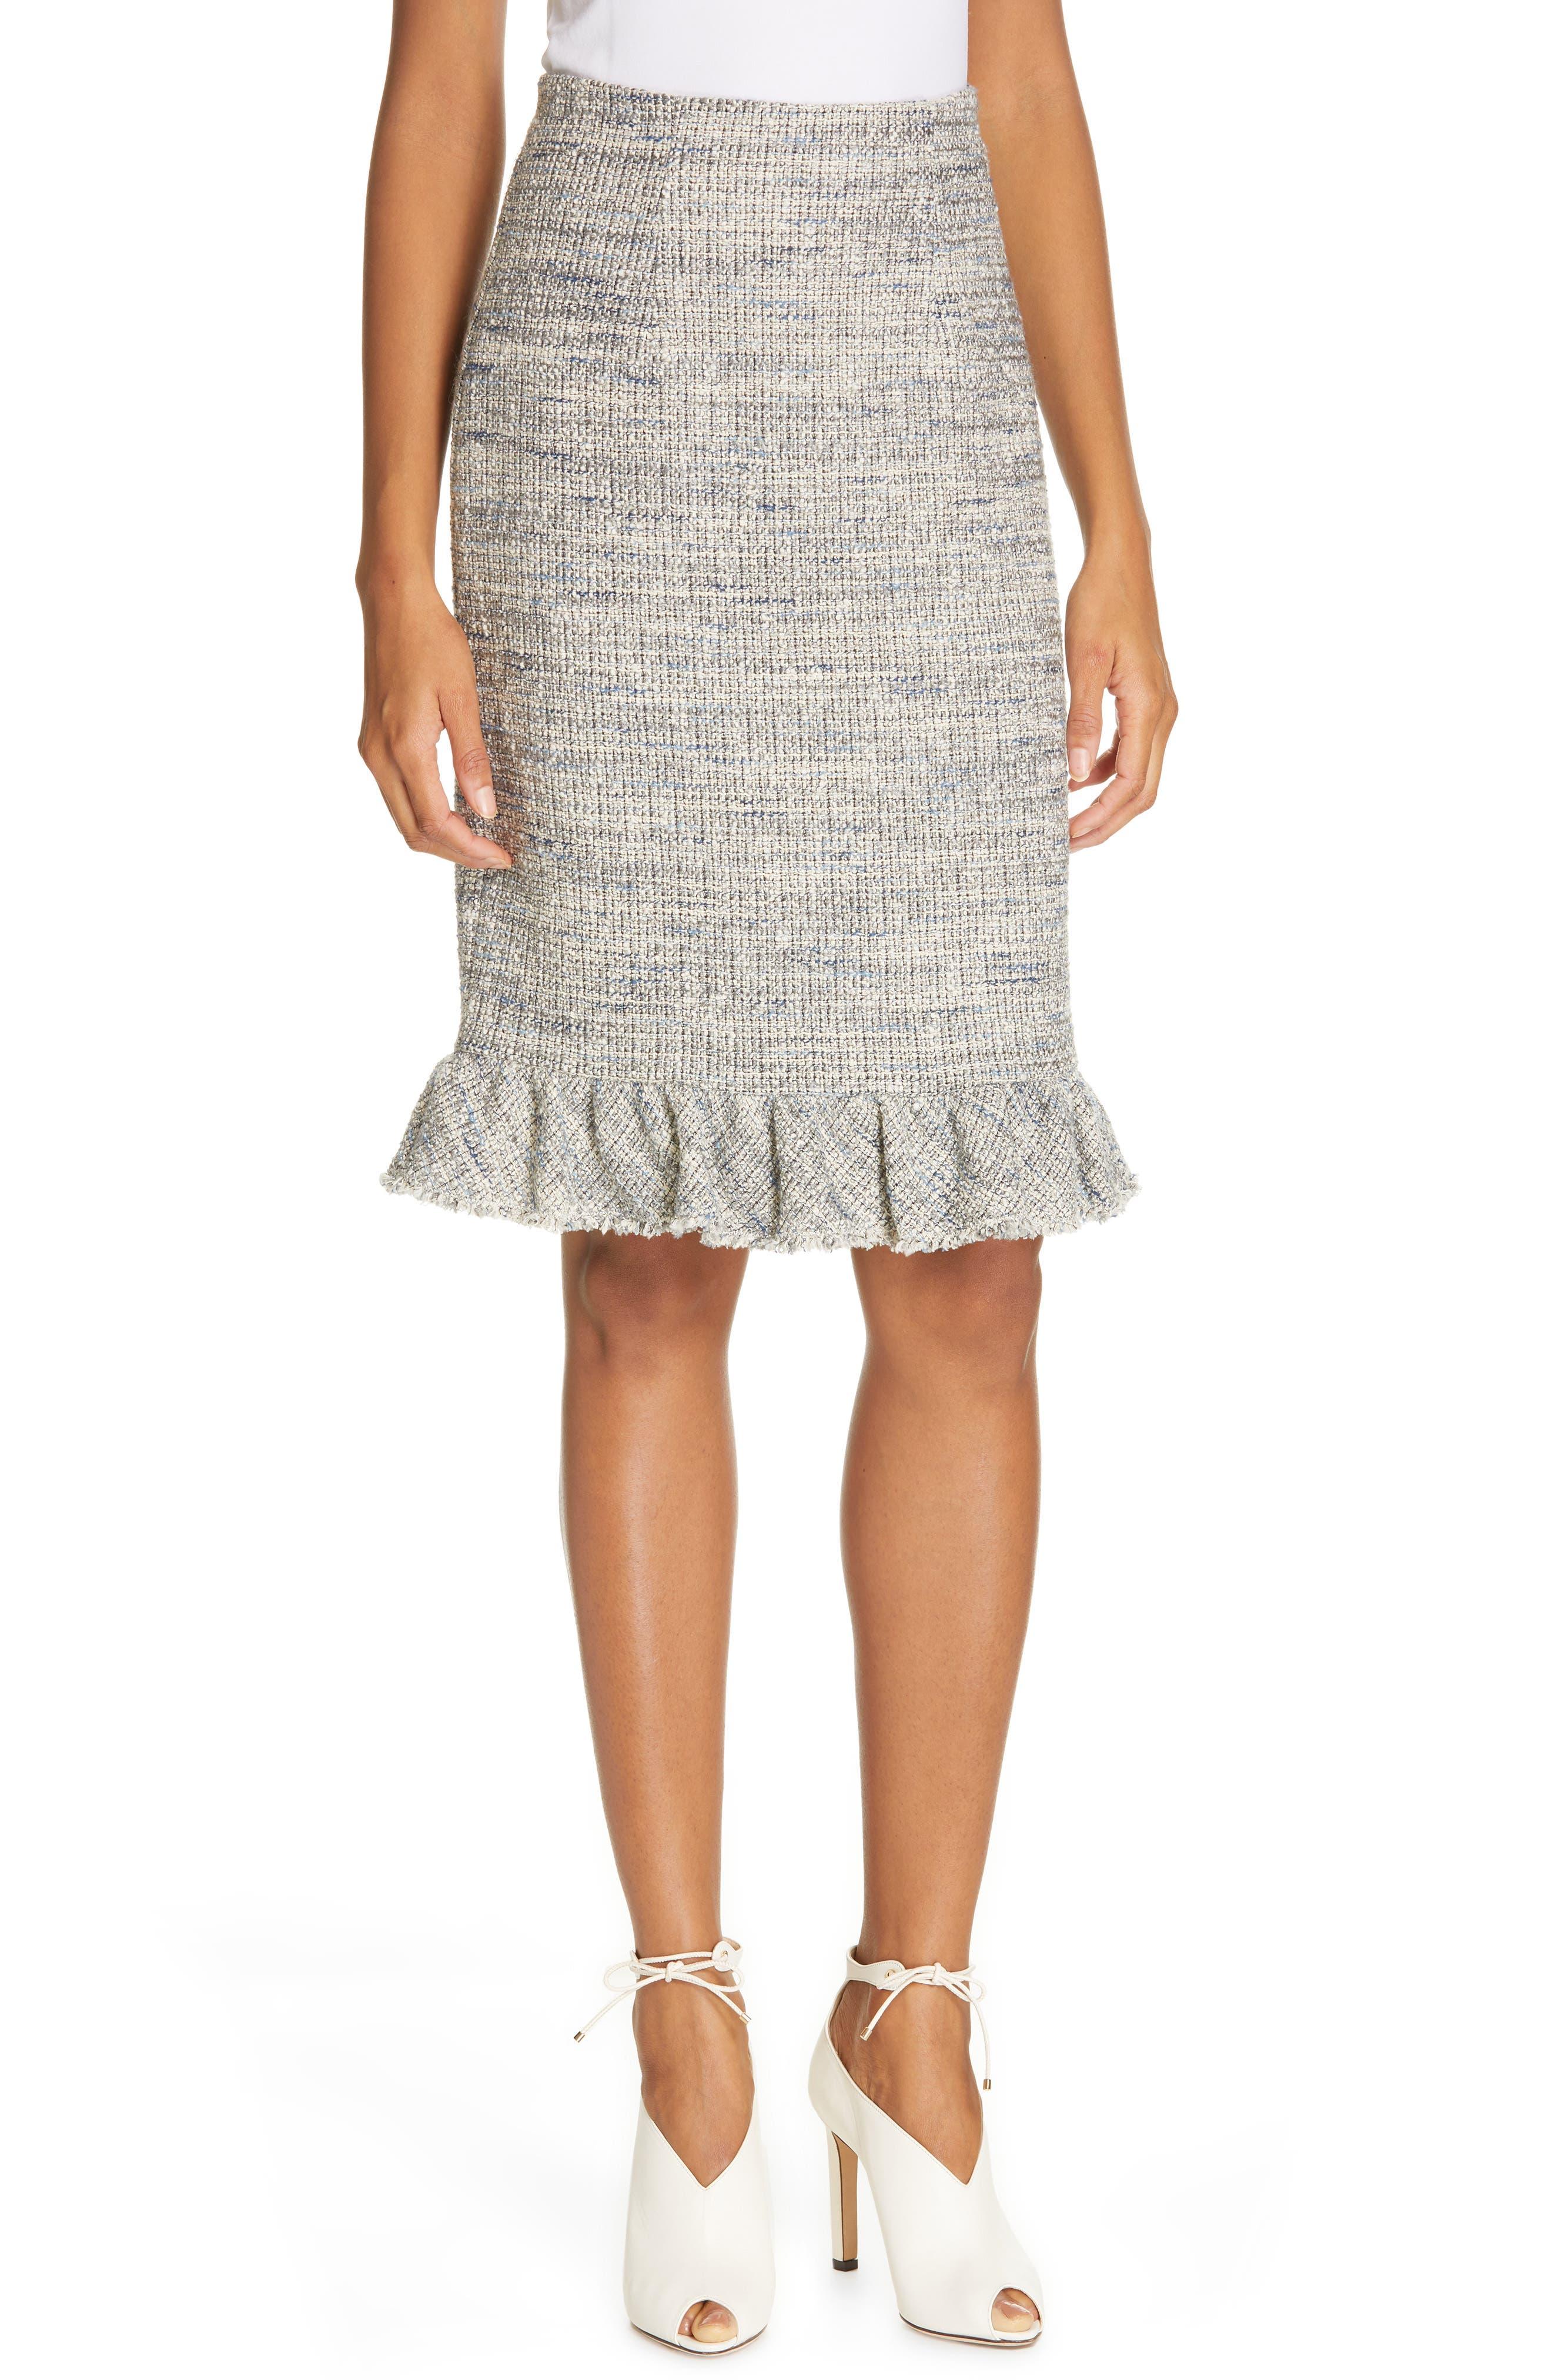 REBECCA TAYLOR, Tweed Ruffle Hem Skirt, Main thumbnail 1, color, 020